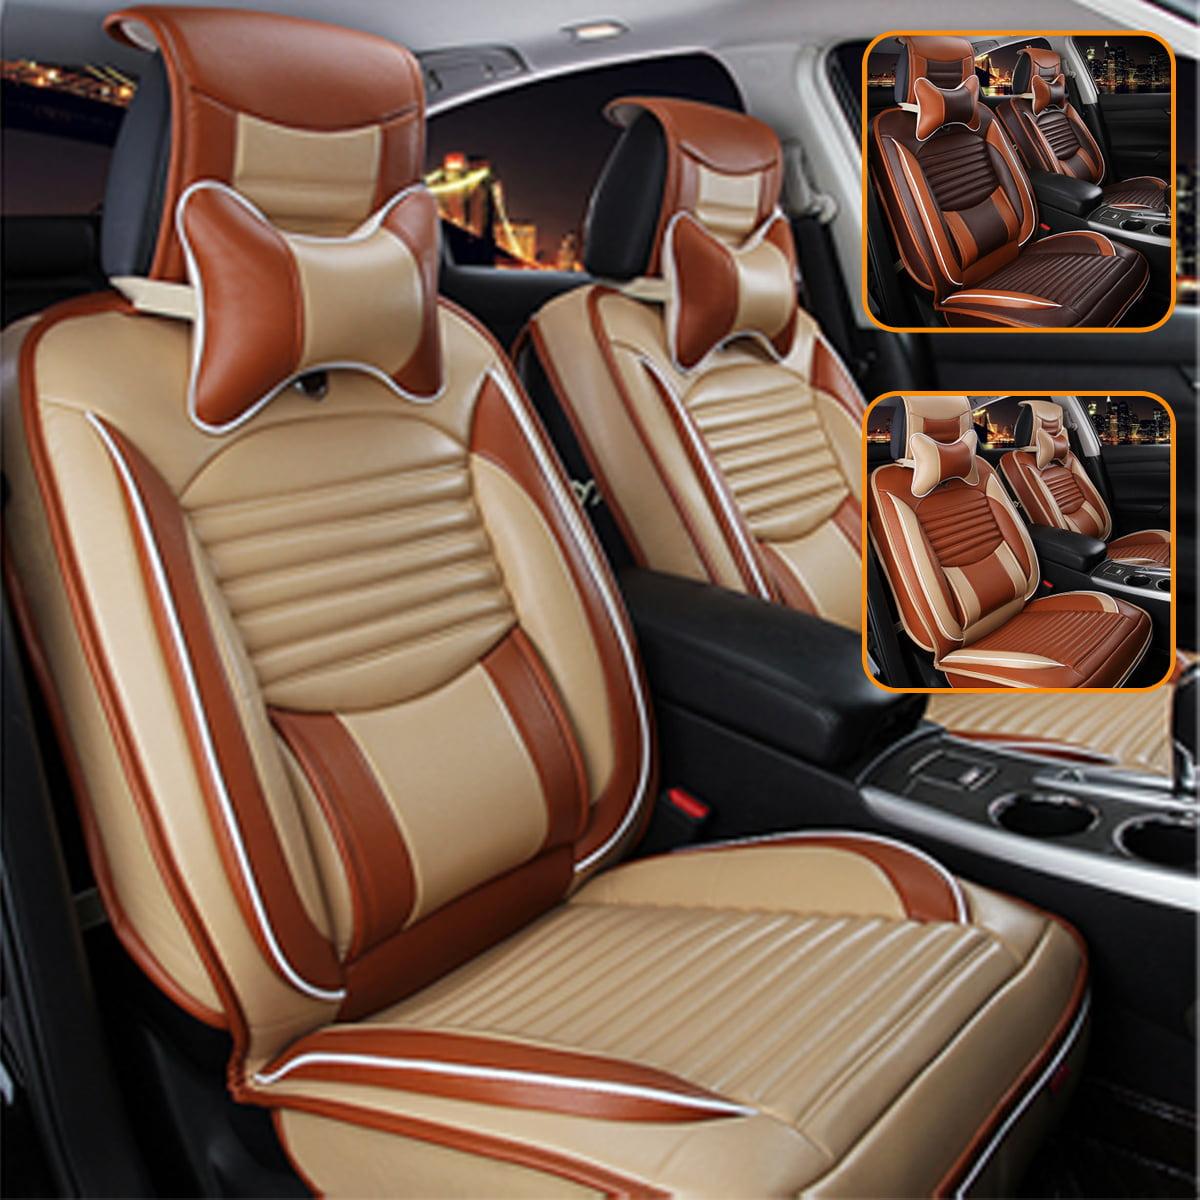 13Pcs Universal 5 Seat Car PU Leather Full Surround Cover Cushion + Pillows Trim Set